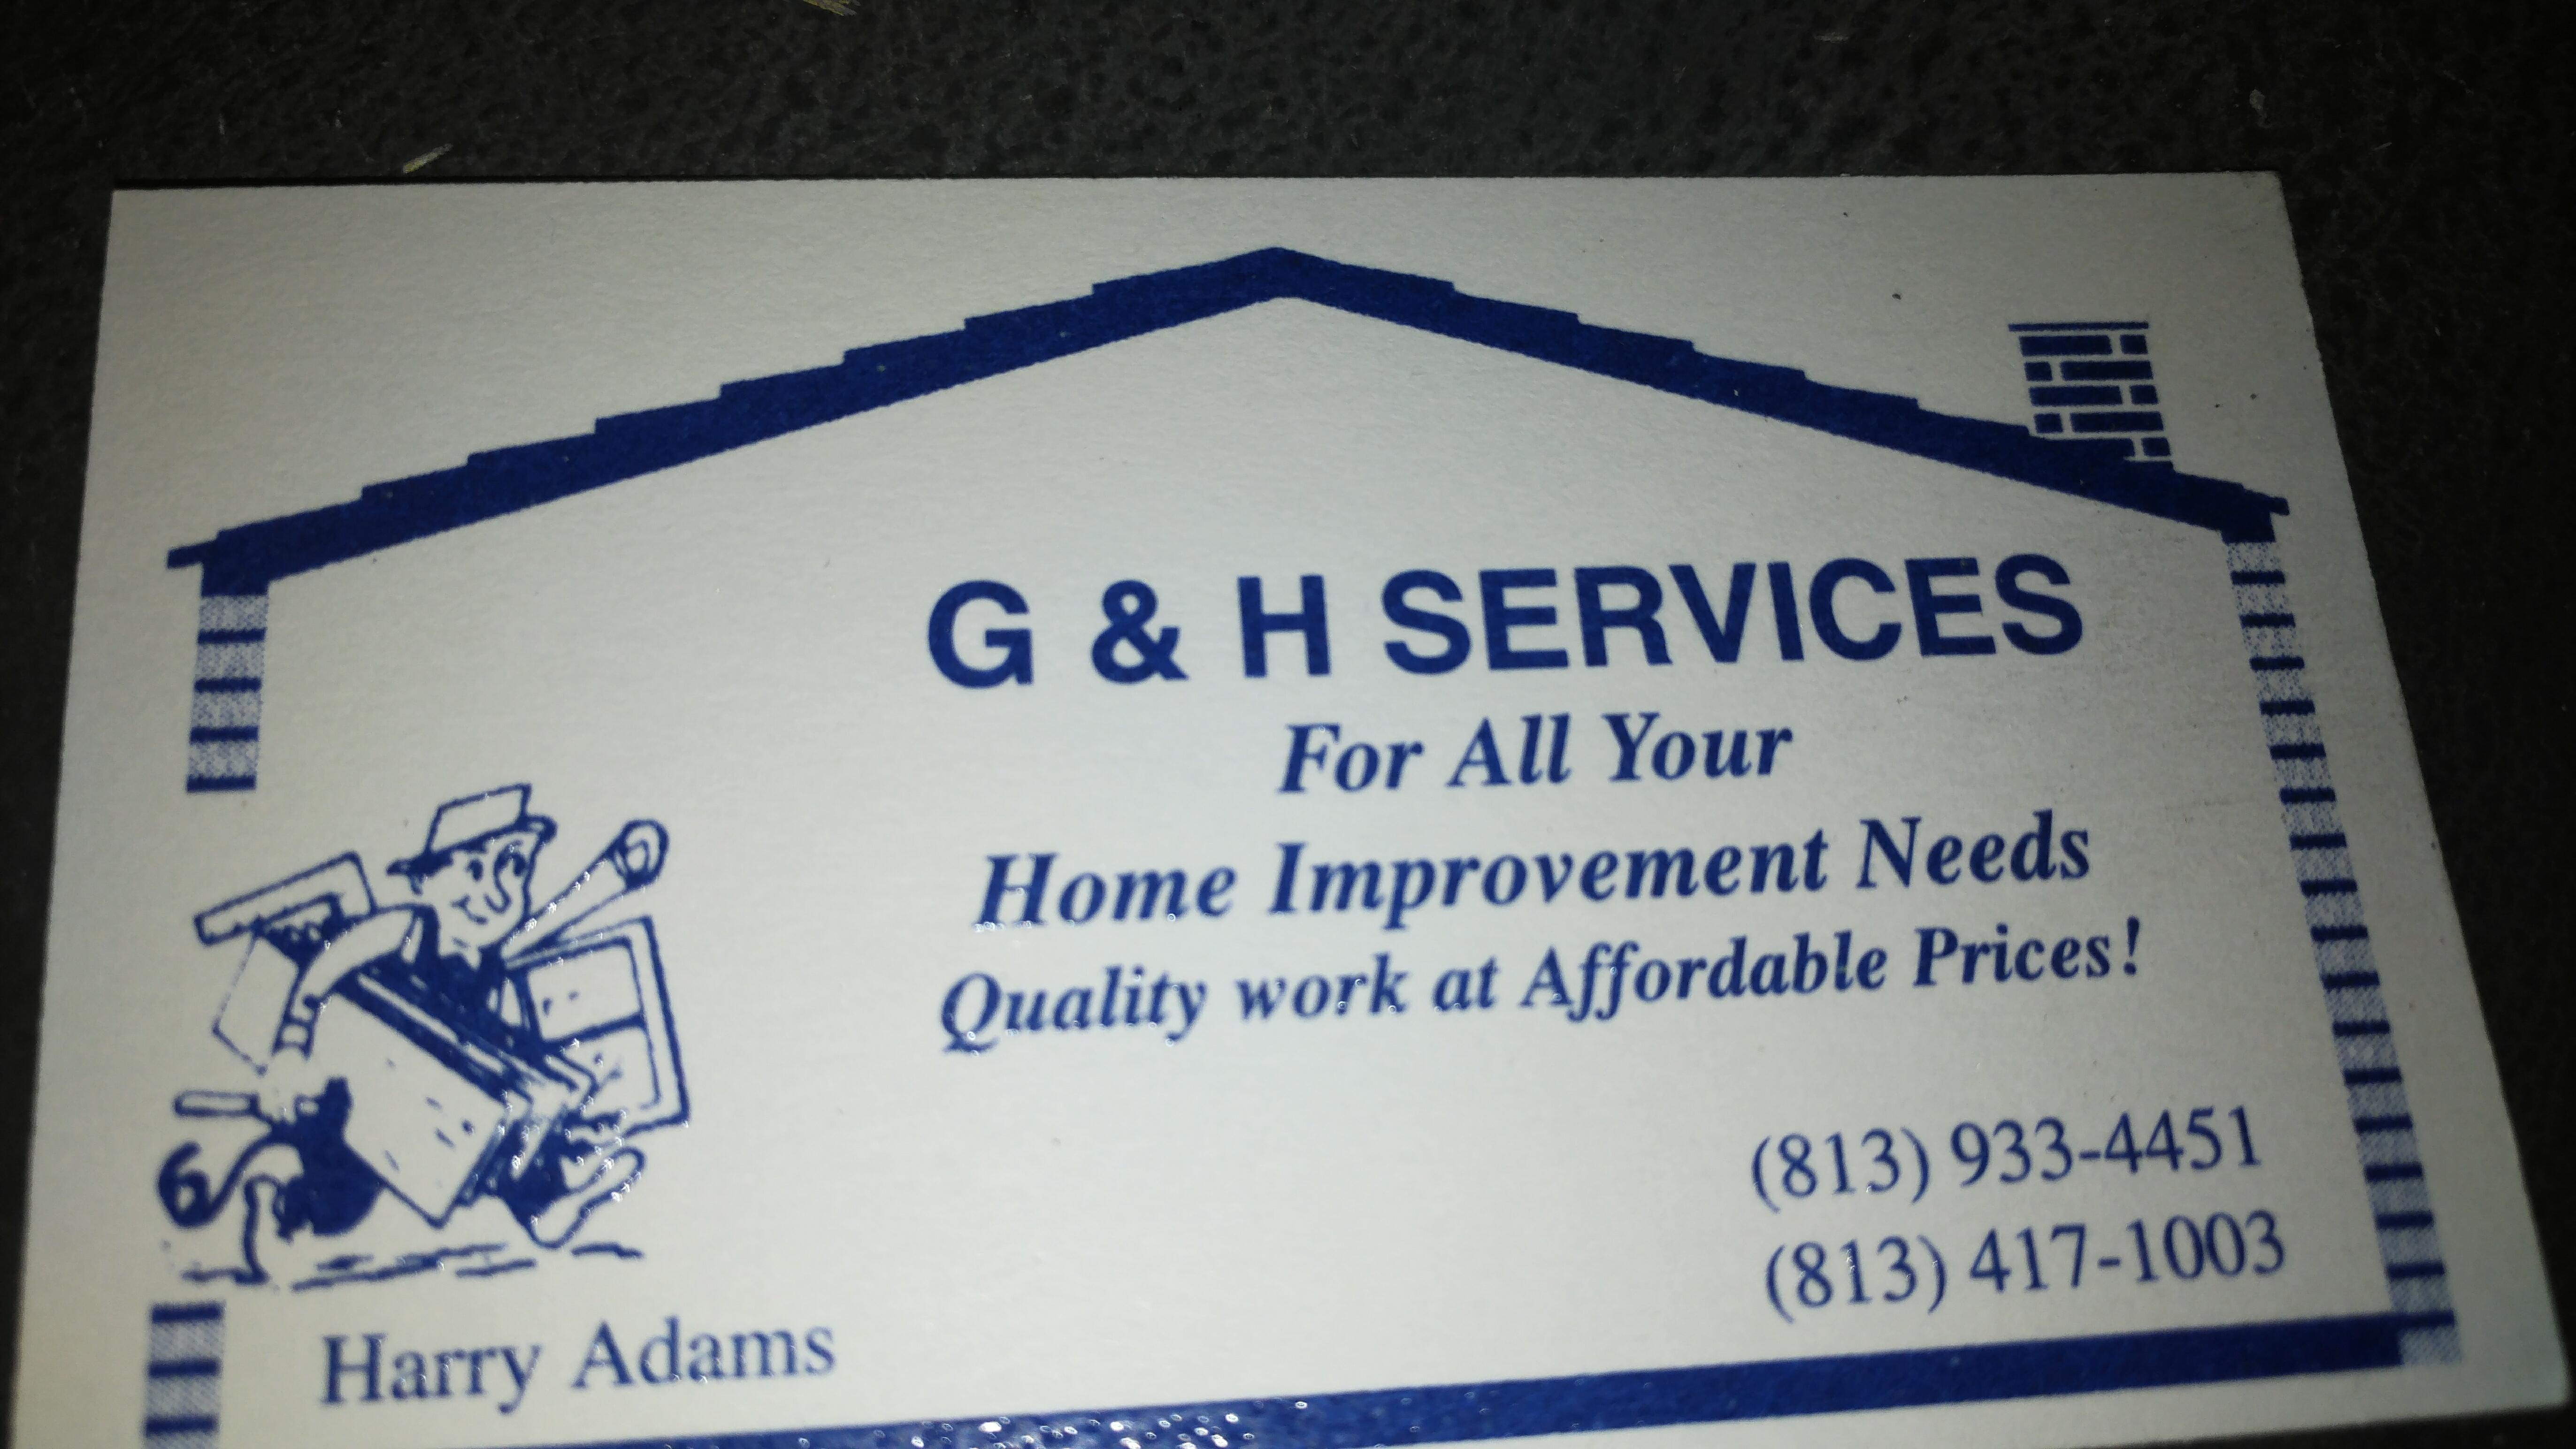 G&H Services image